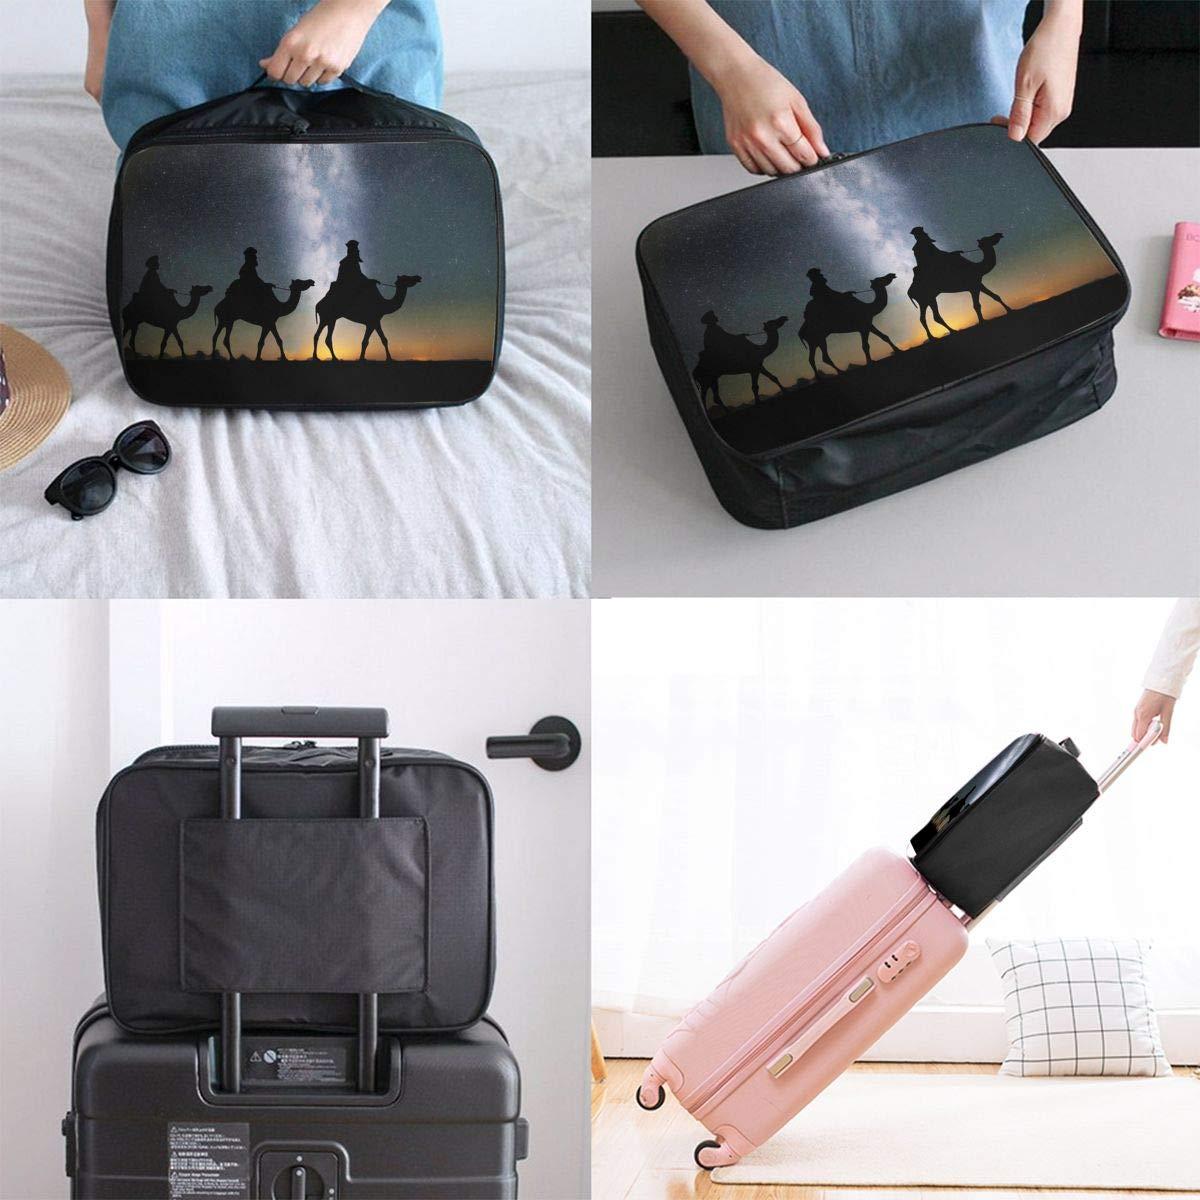 ADGAI Arabian Camel Caravan Canvas Travel Weekender Bag,Fashion Custom Lightweight Large Capacity Portable Luggage Bag,Suitcase Trolley Bag